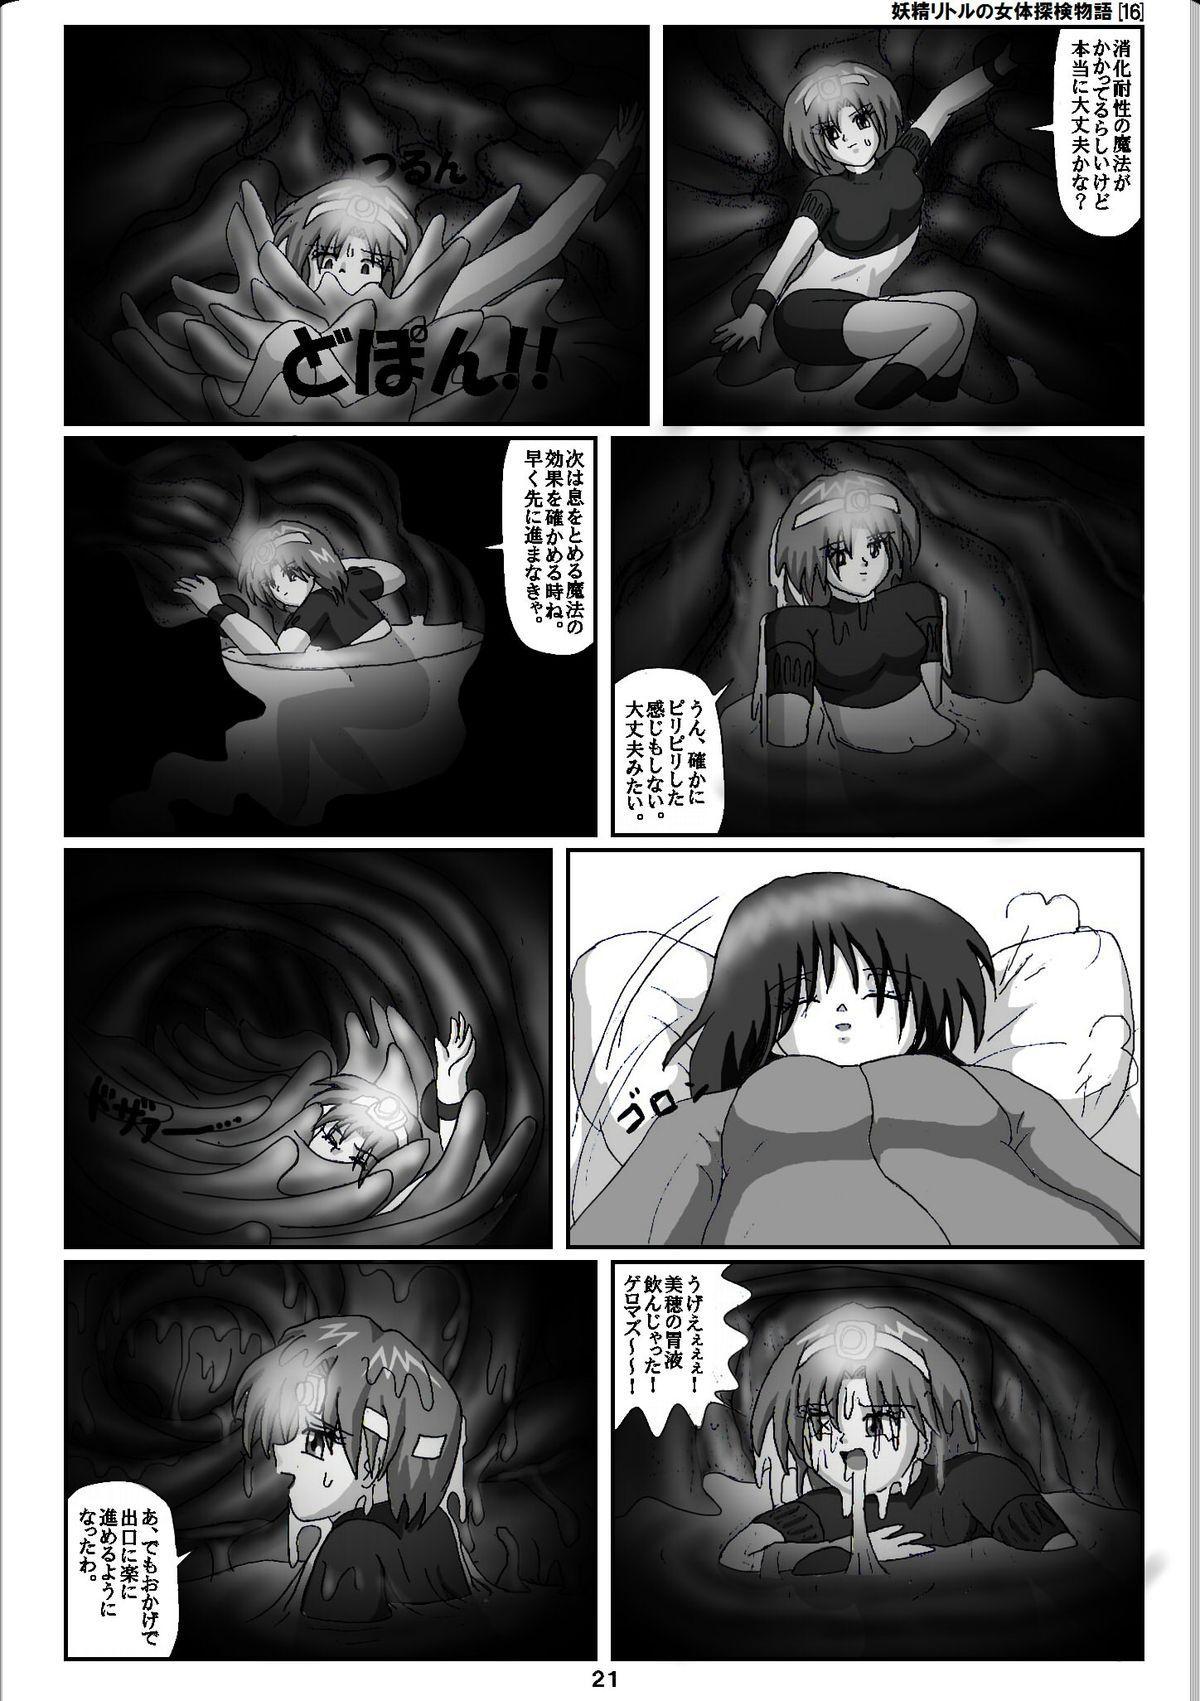 Yousei Little no Nyotai Tanken Monogatari 20